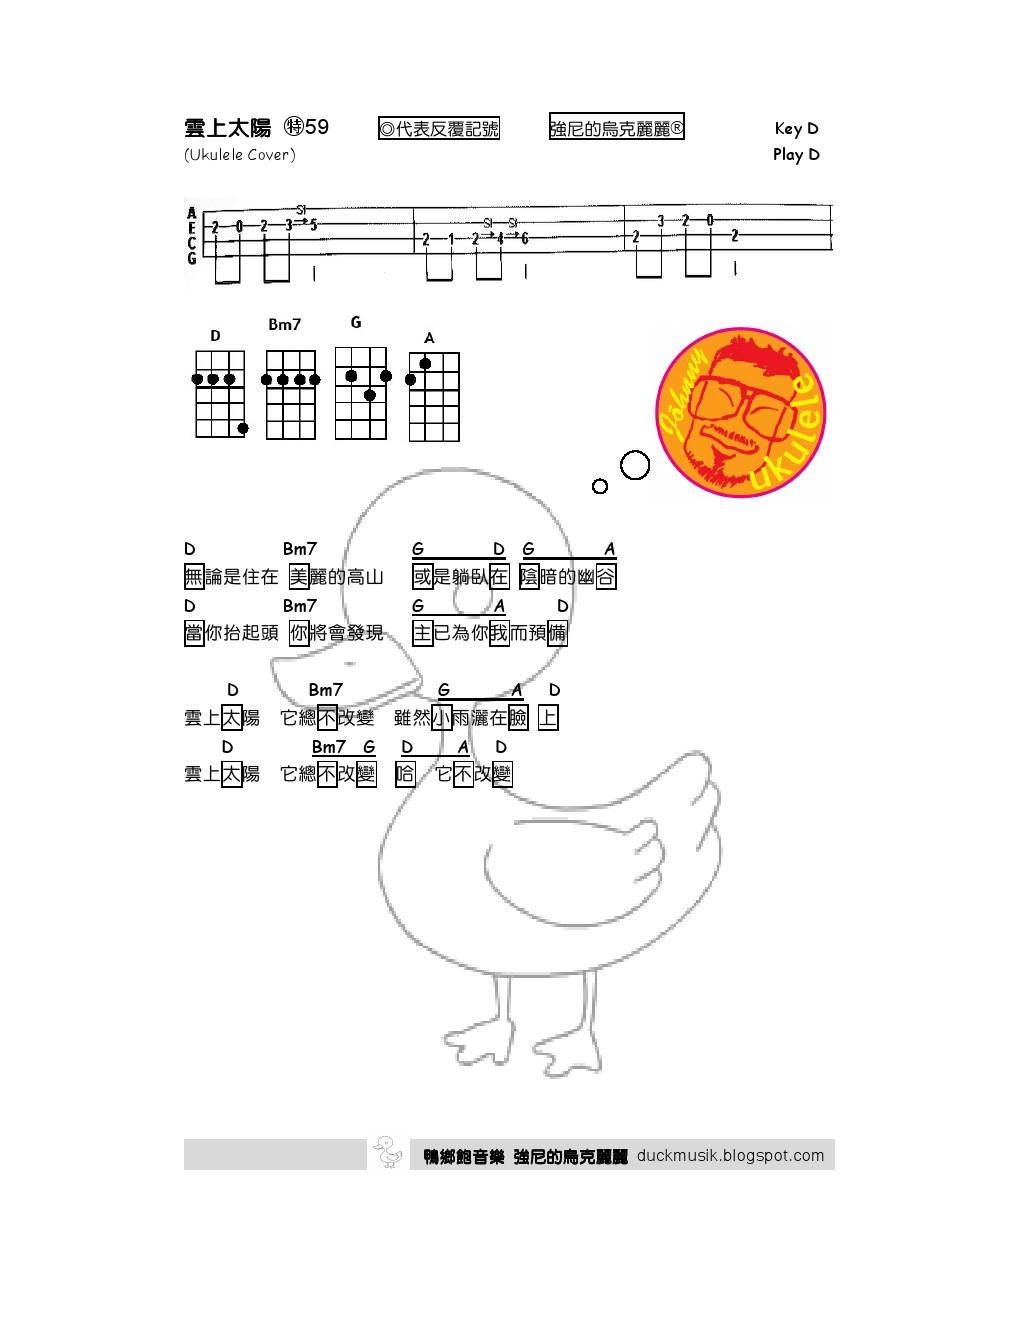 強尼的烏克麗麗 Johnny Ukulele音樂教室: 雲上太陽 教會詩歌 強尼的烏克麗麗譜 Johnny's Ukulele cover